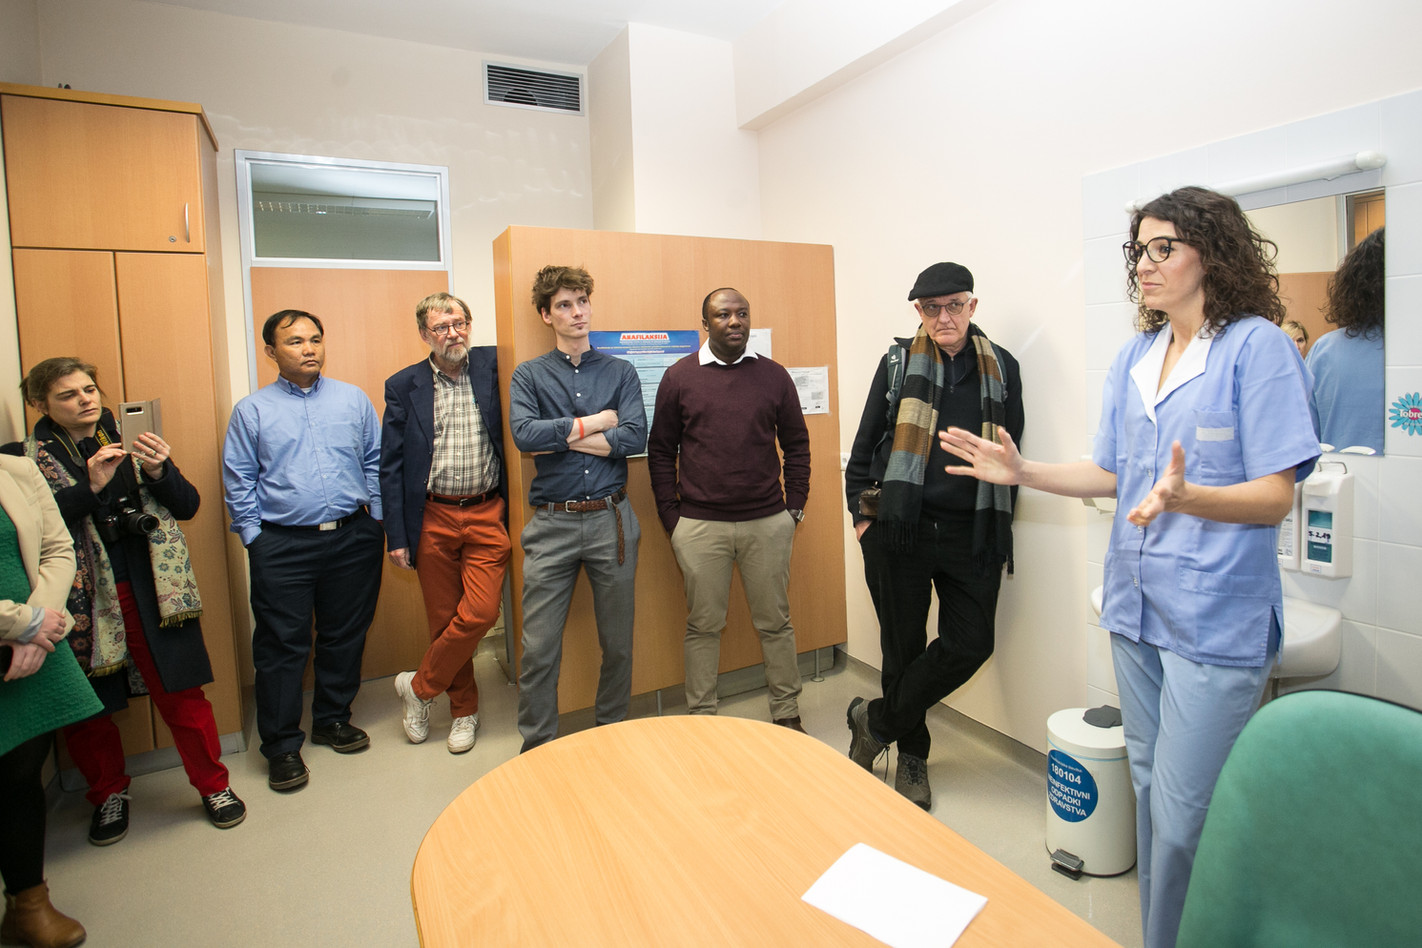 Metka Žitnik, explaining her duties as a registered nurse in a model practice of family medicine